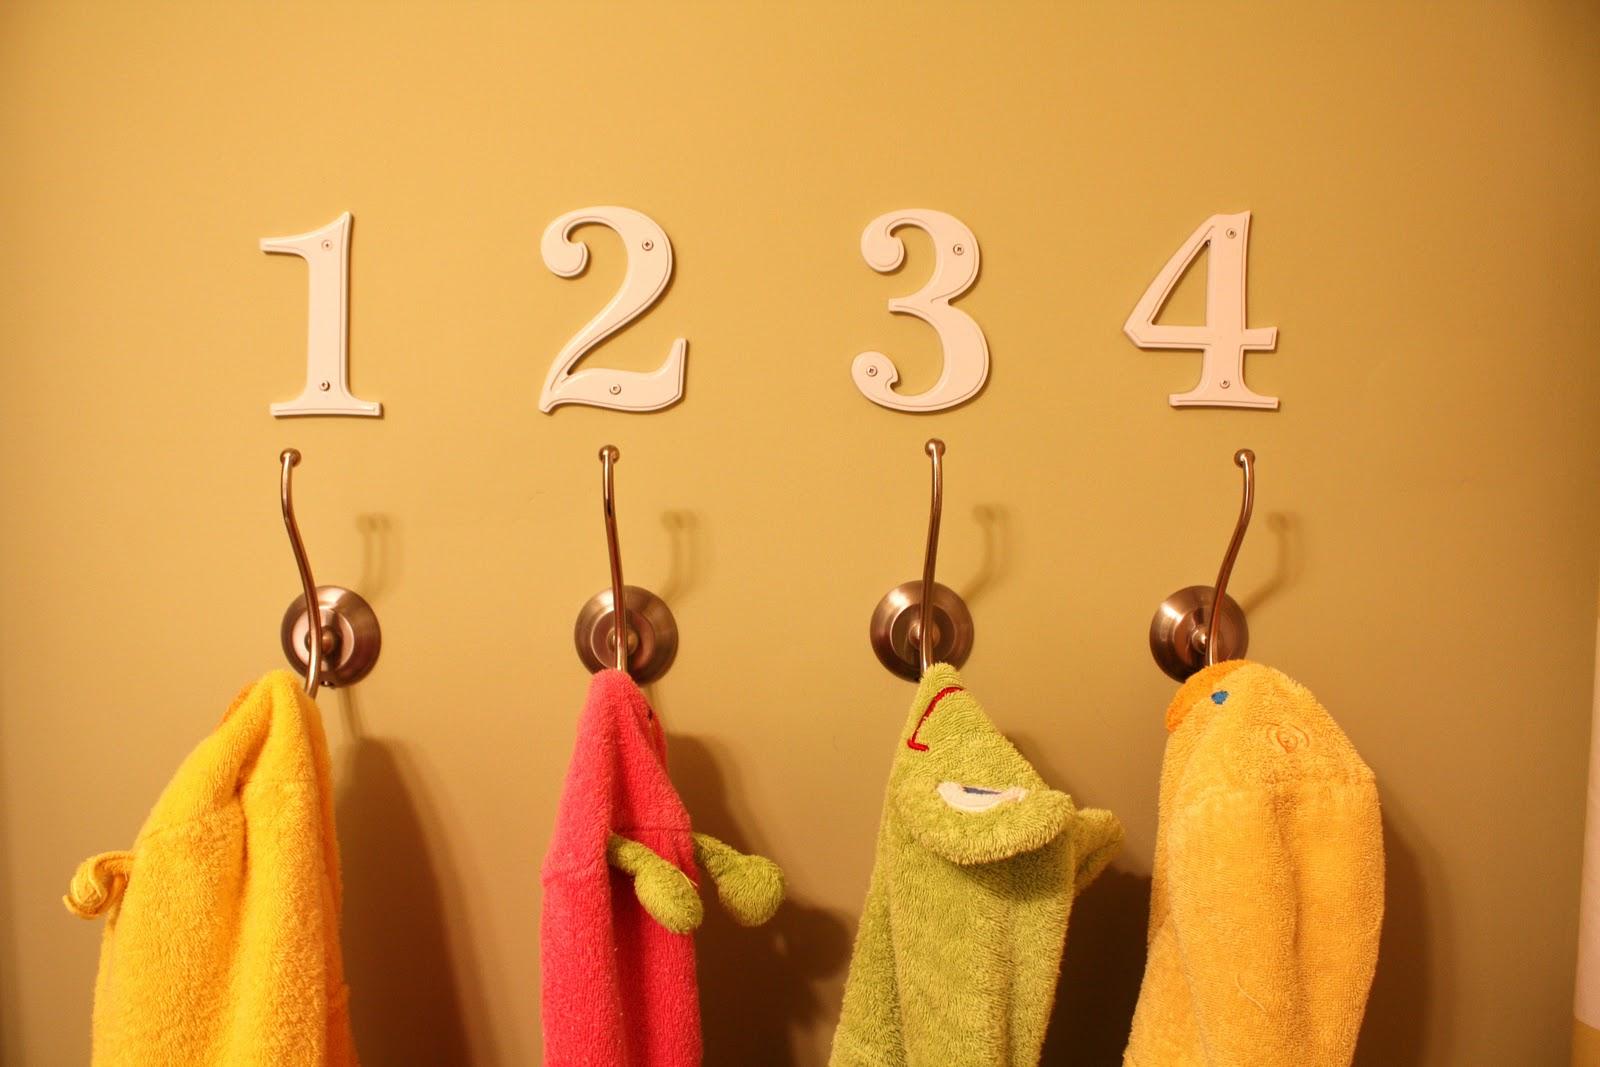 My Kids\' Bathroom: Creating a Shared Space - Emily A. Clark